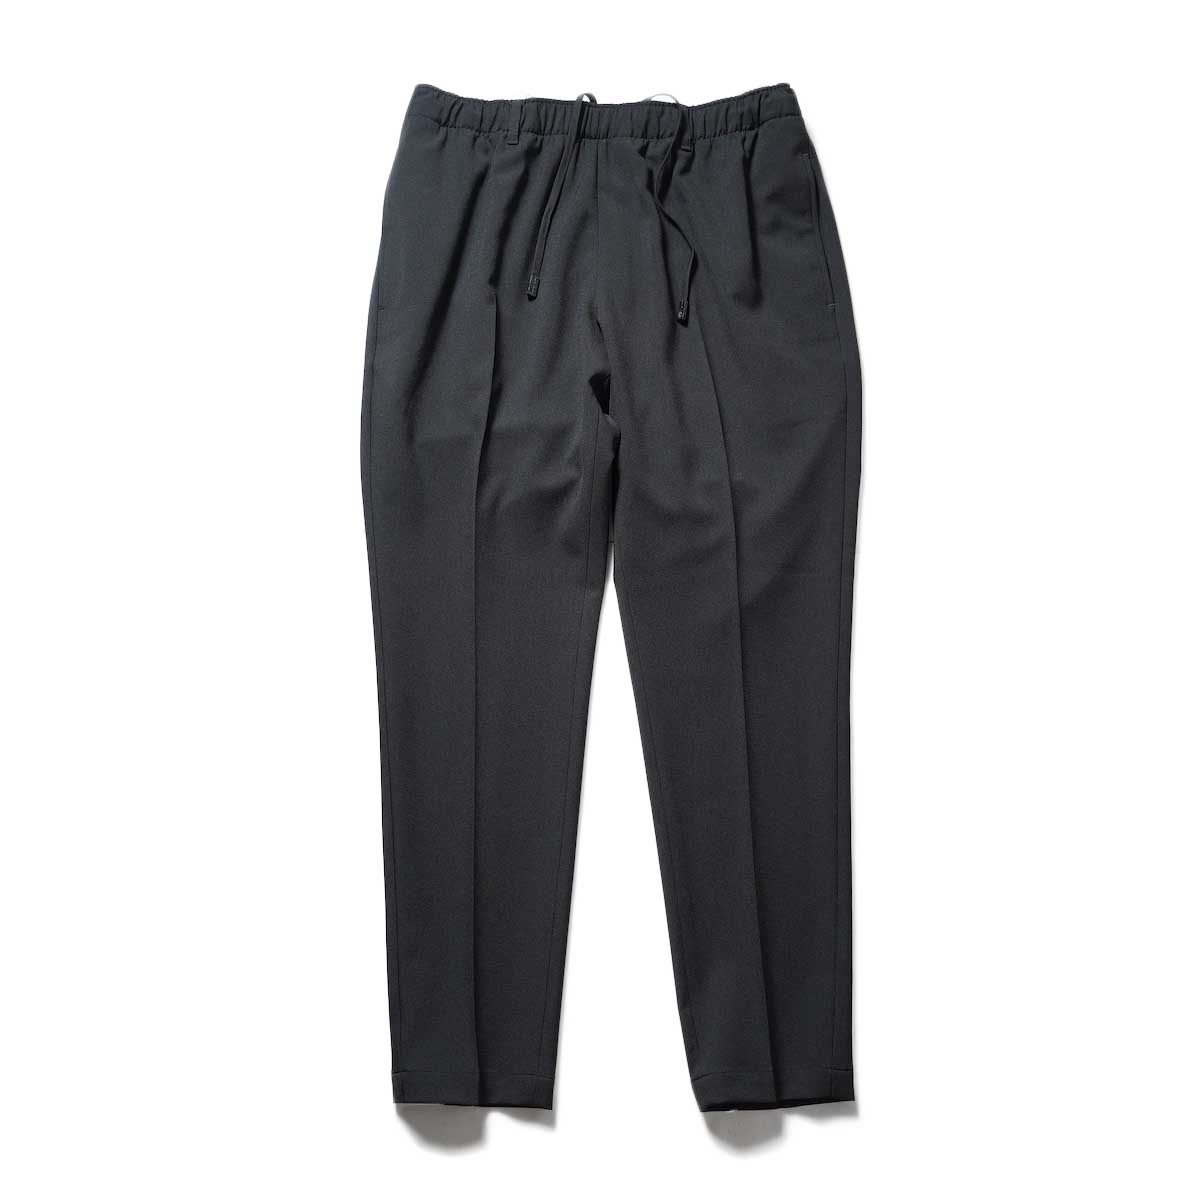 N.HOOLYWOOD / 2212-CP07-008 peg Tapered Easy Pants (Black)